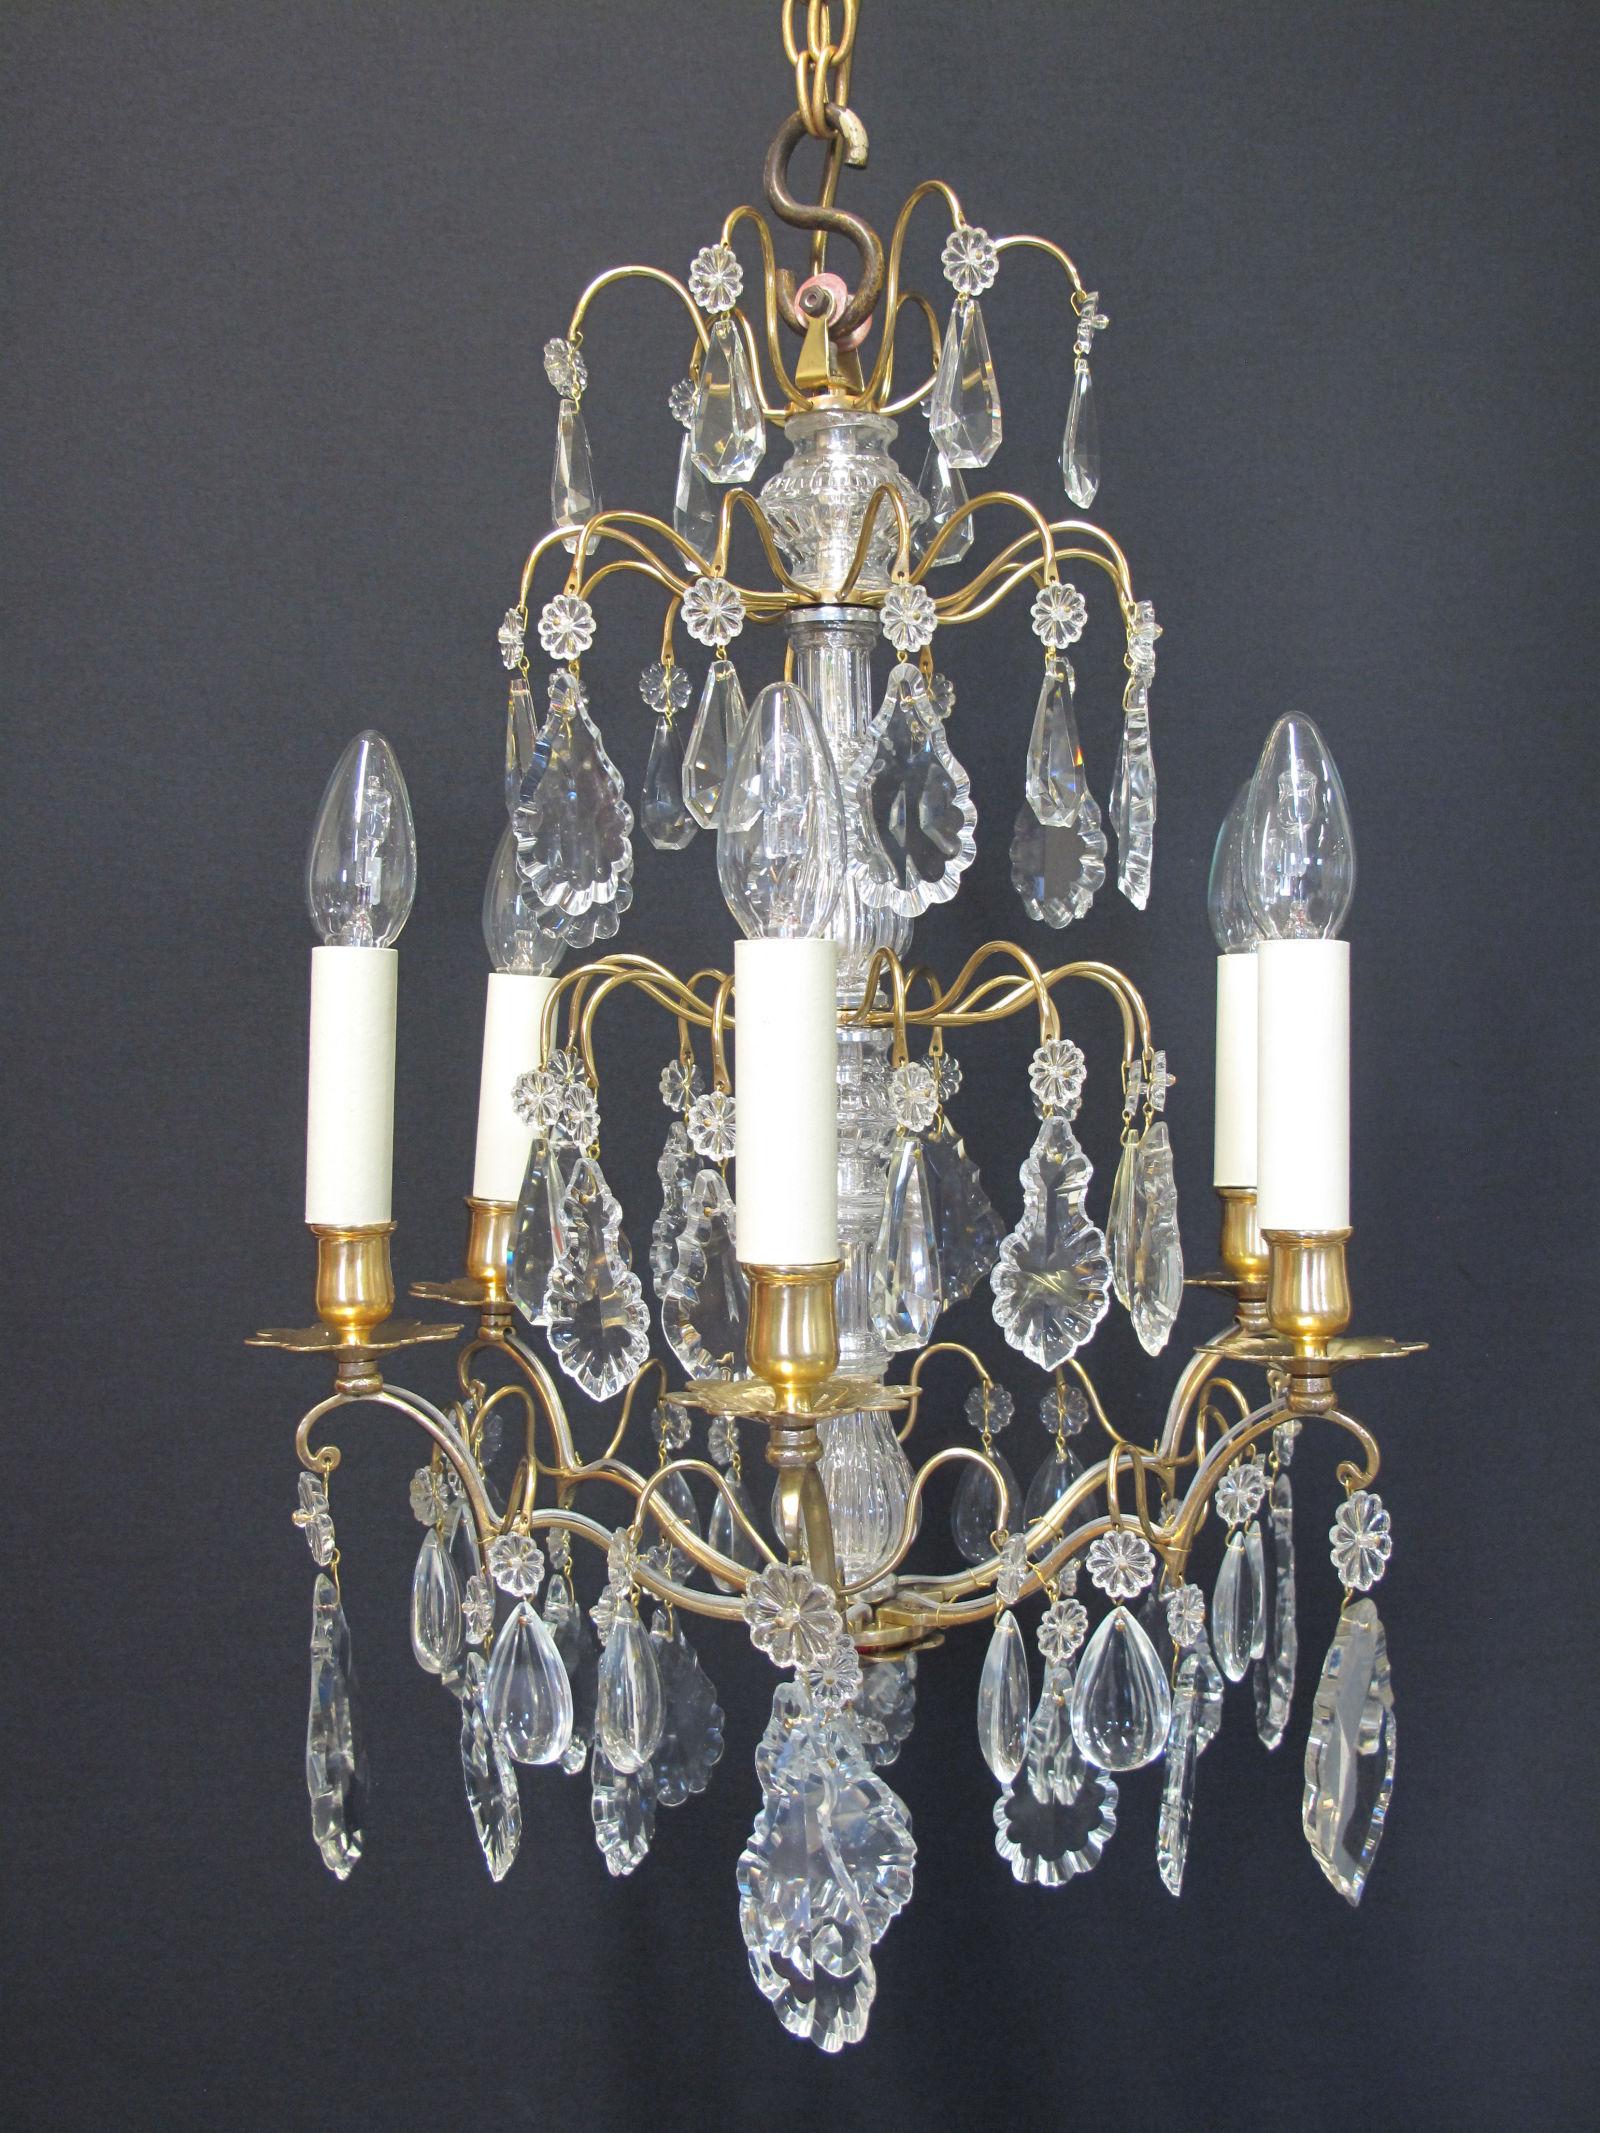 G p cohn antique chandeliers repairs restoration 6 arm french chandelier ca 1910 arubaitofo Gallery